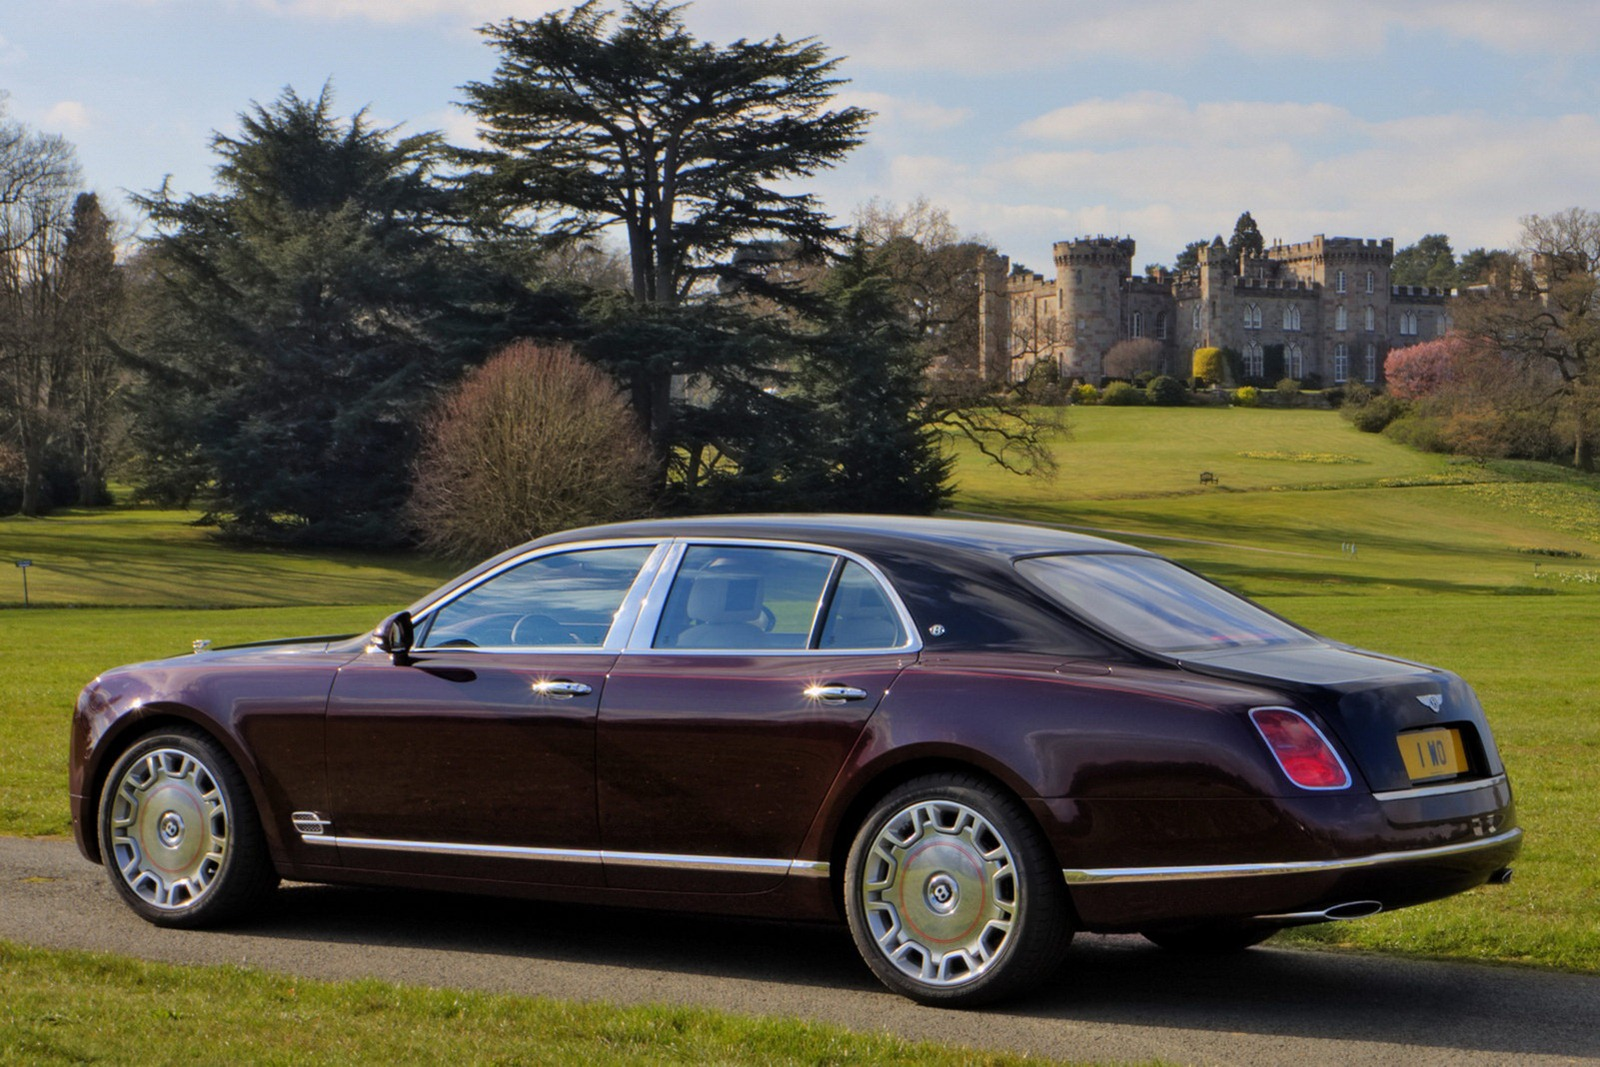 Classic Cars Authority: Bentley Mulsanne Royal Diamond